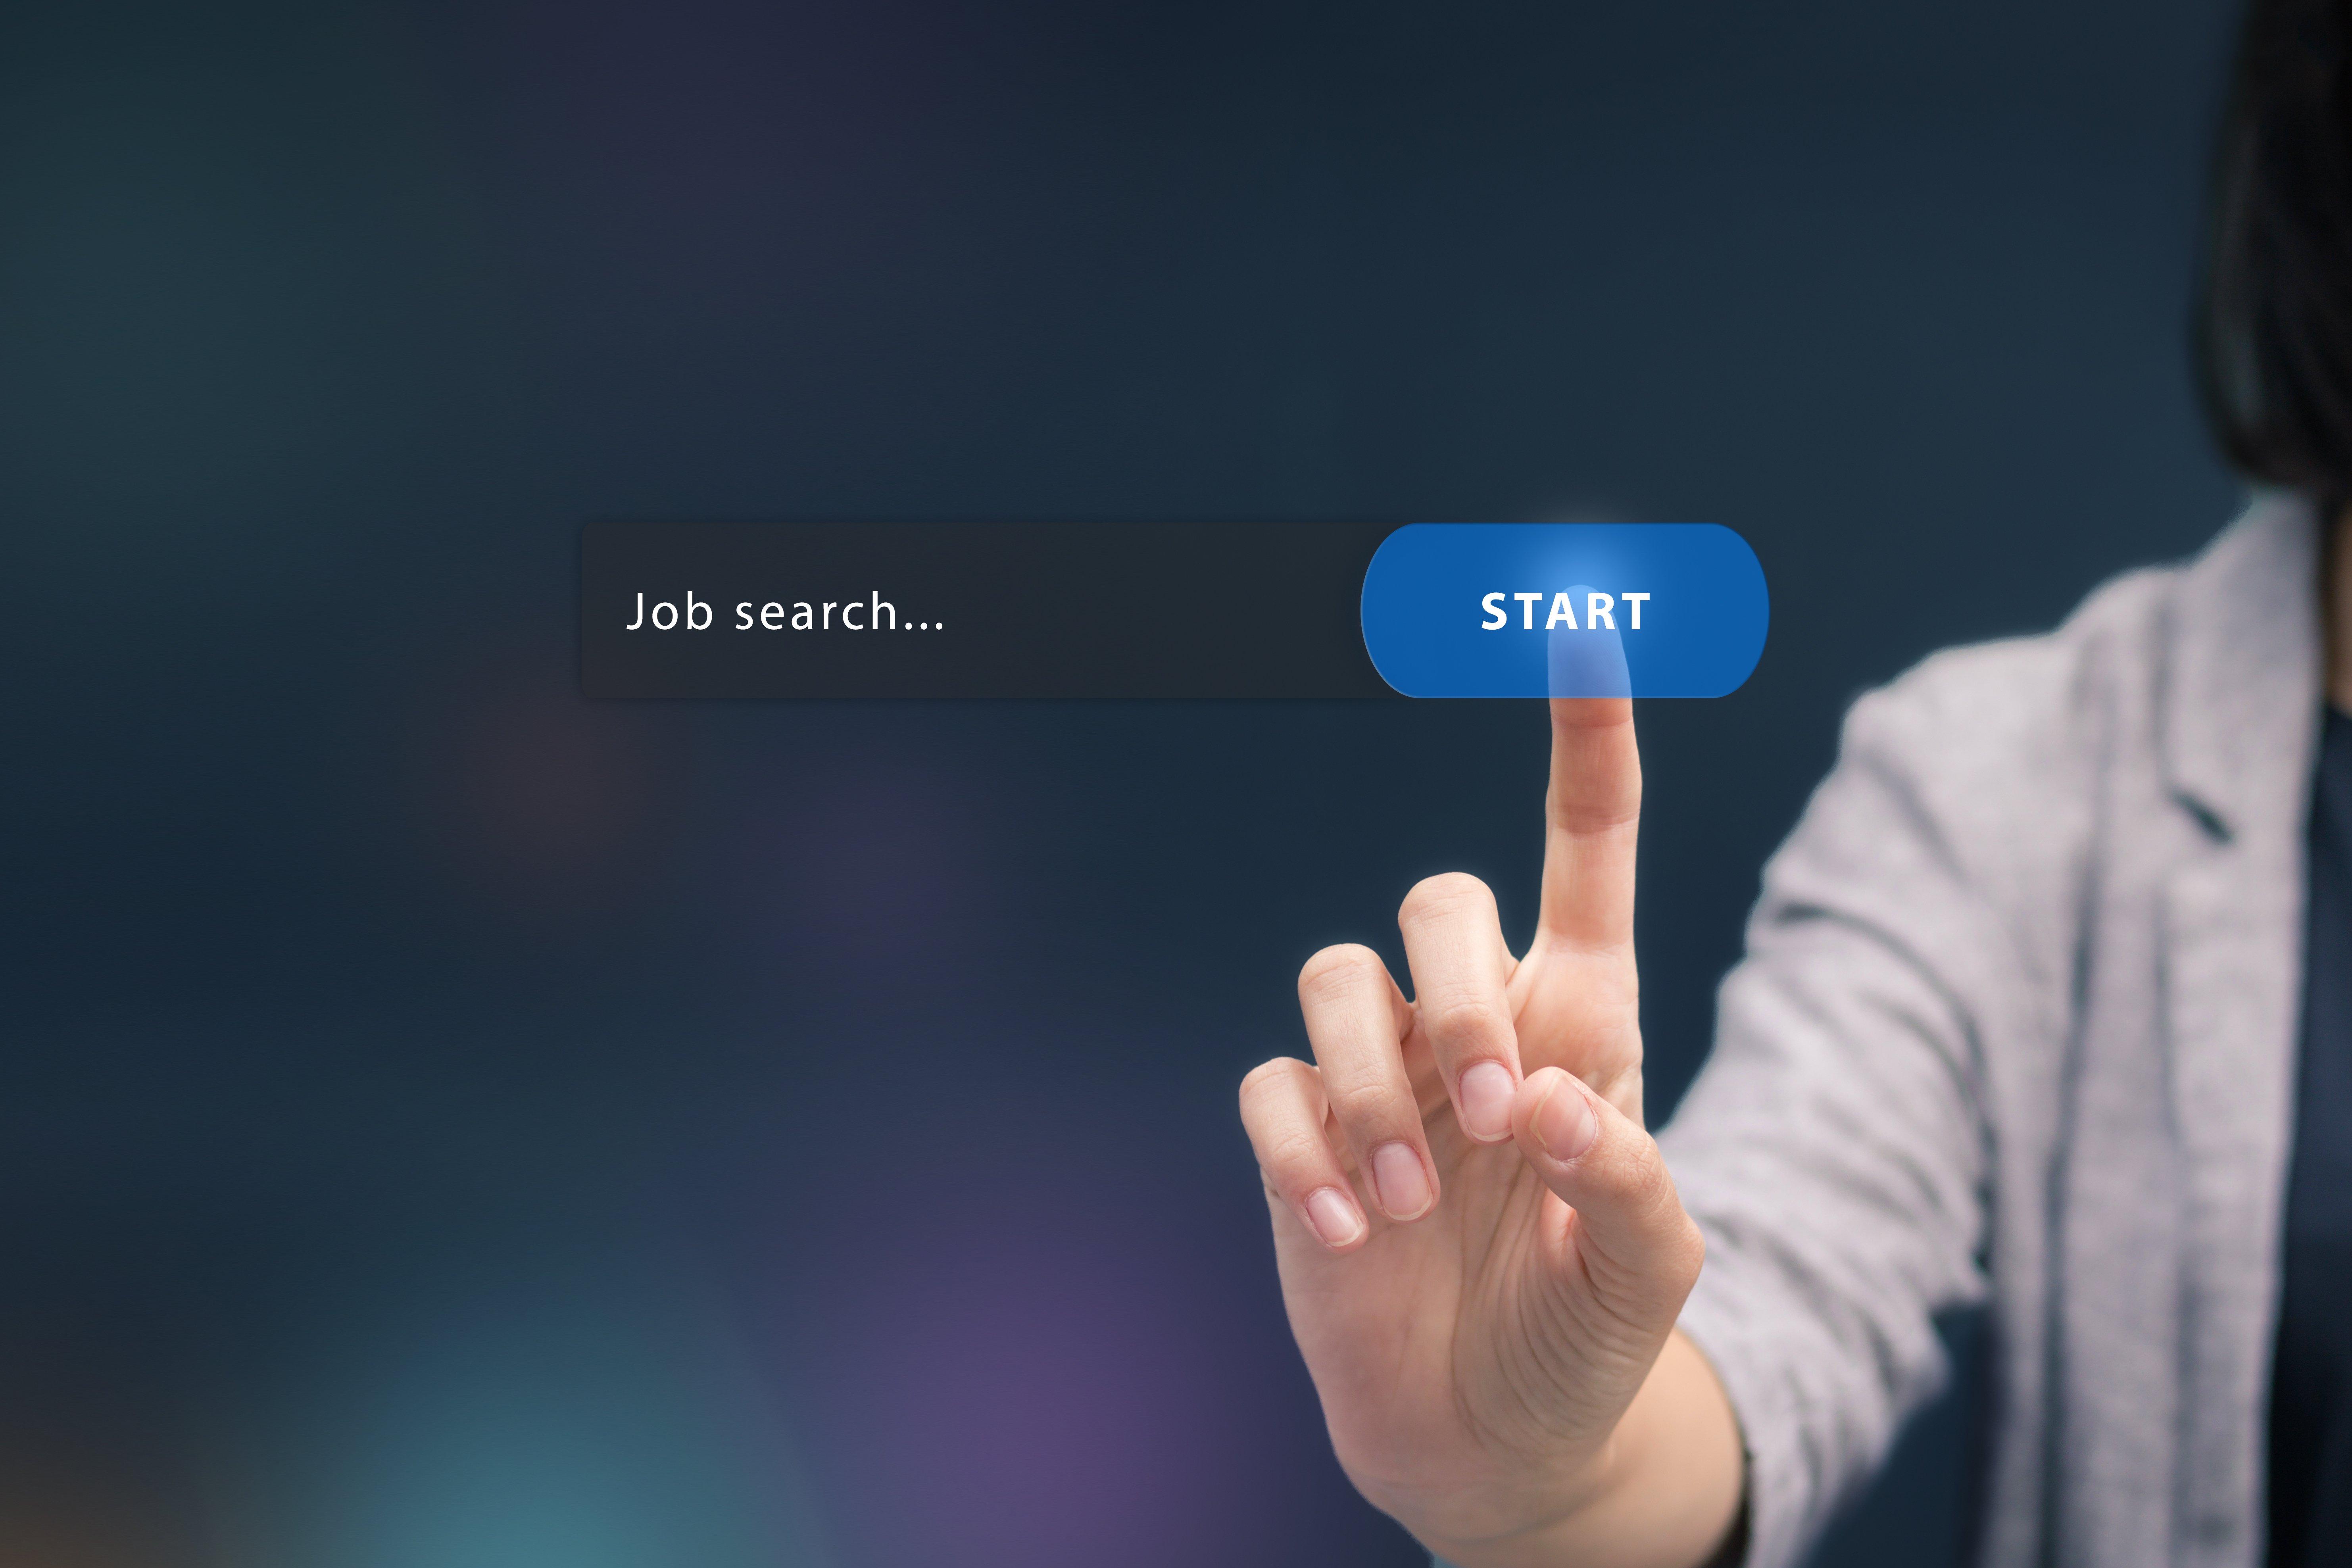 Job search start